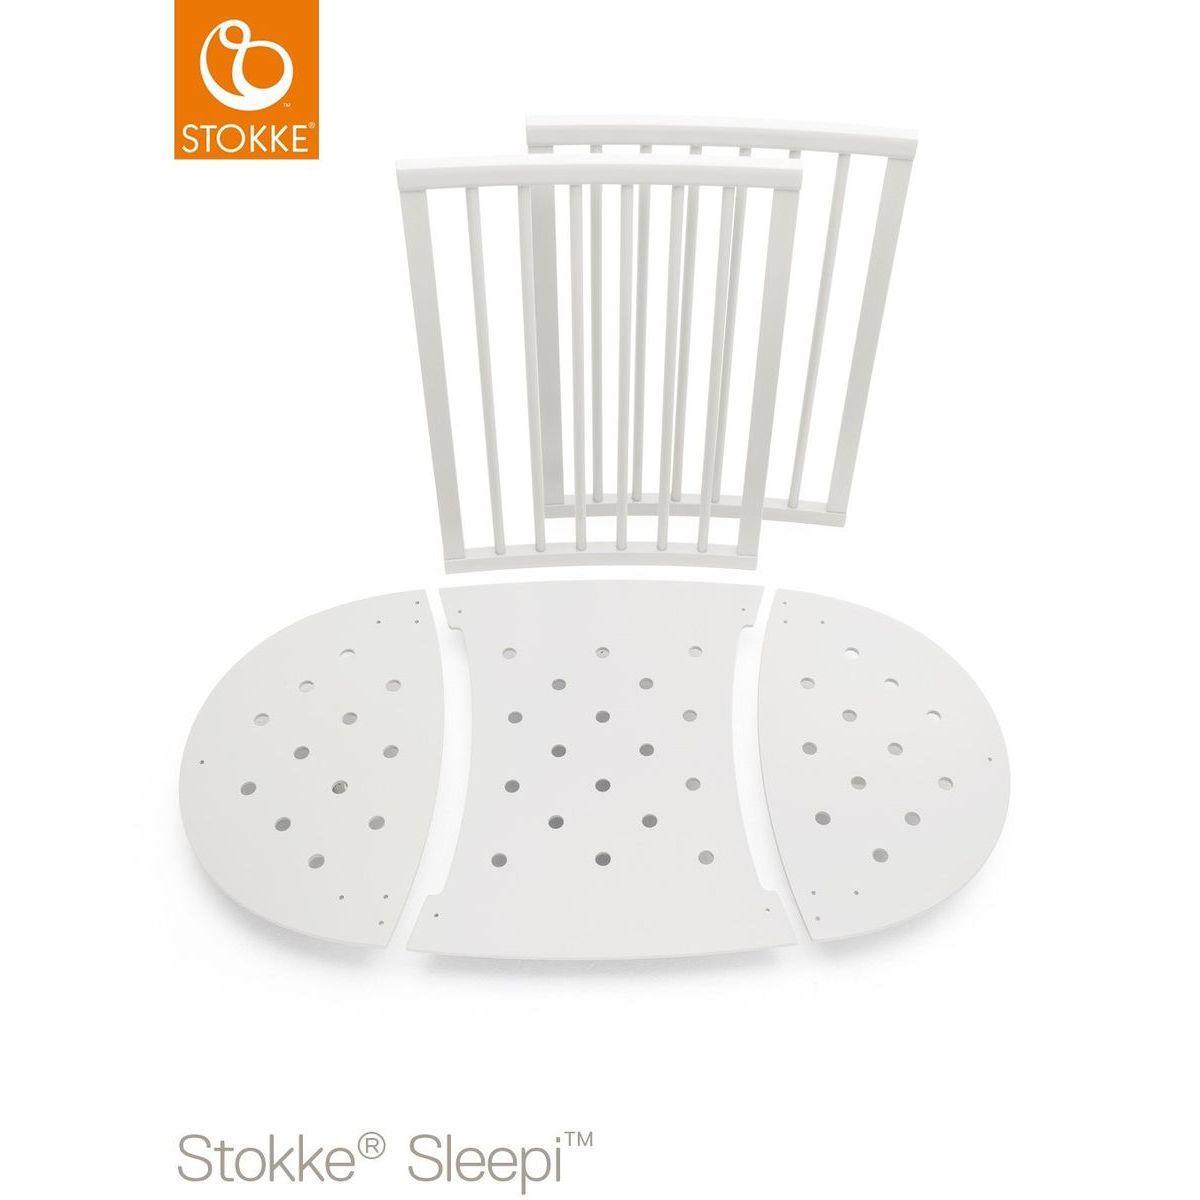 Bettverlängerung Babybett SLEEPI Stokke white